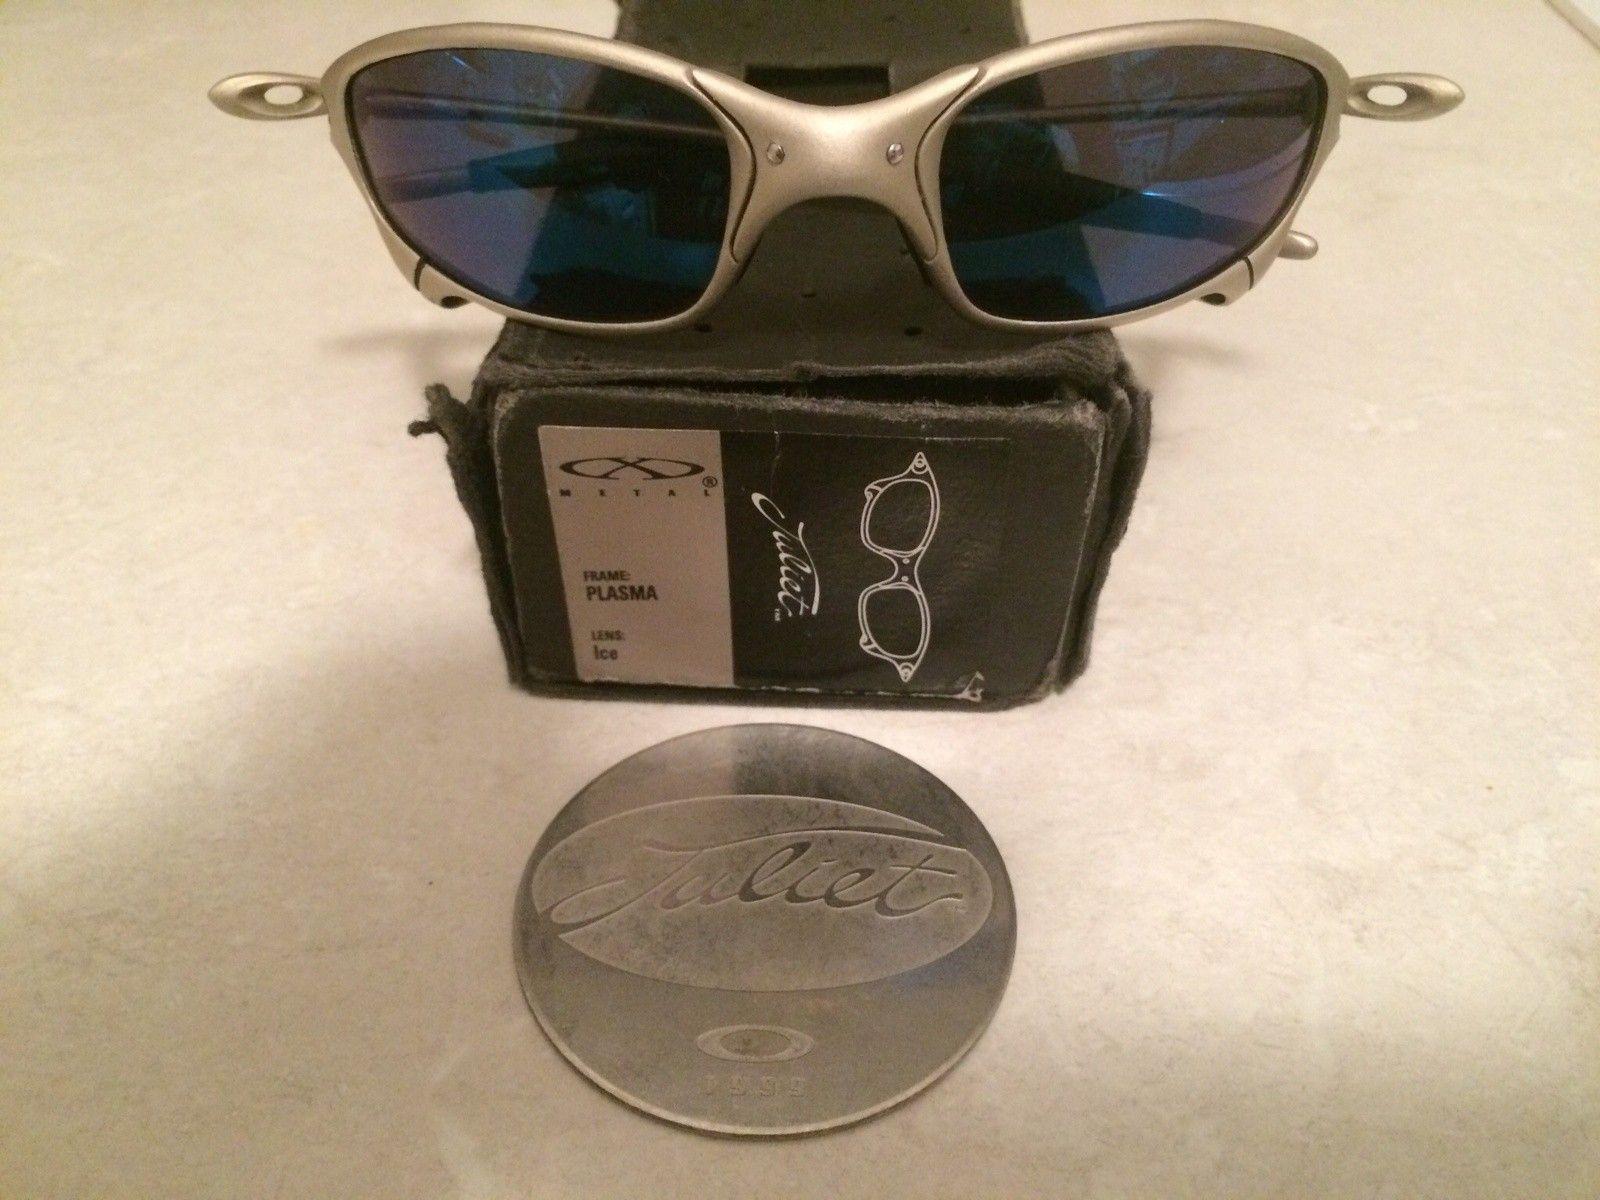 My small Penny-bias x-metal collection - image.jpg